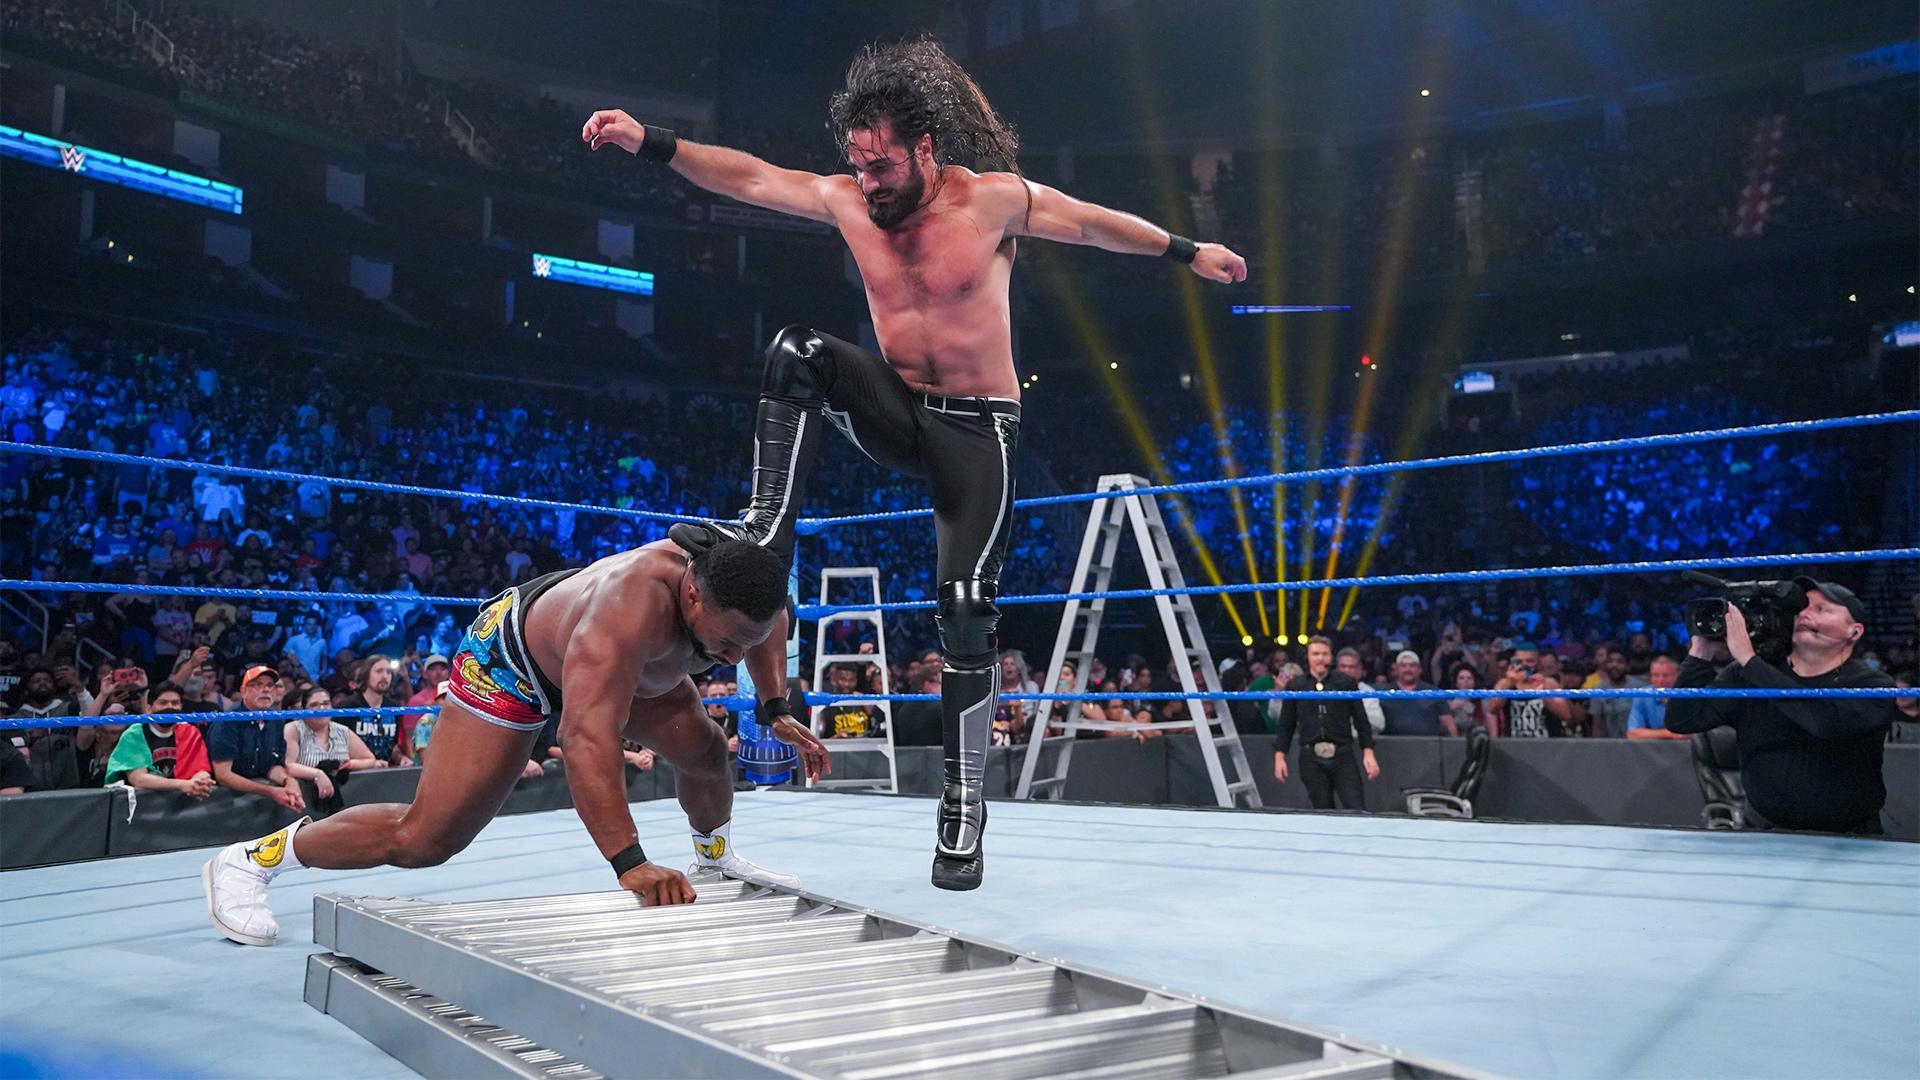 Cobertura: WWE Friday Night SmackDown (16/07/2021) – Subindo os degraus!